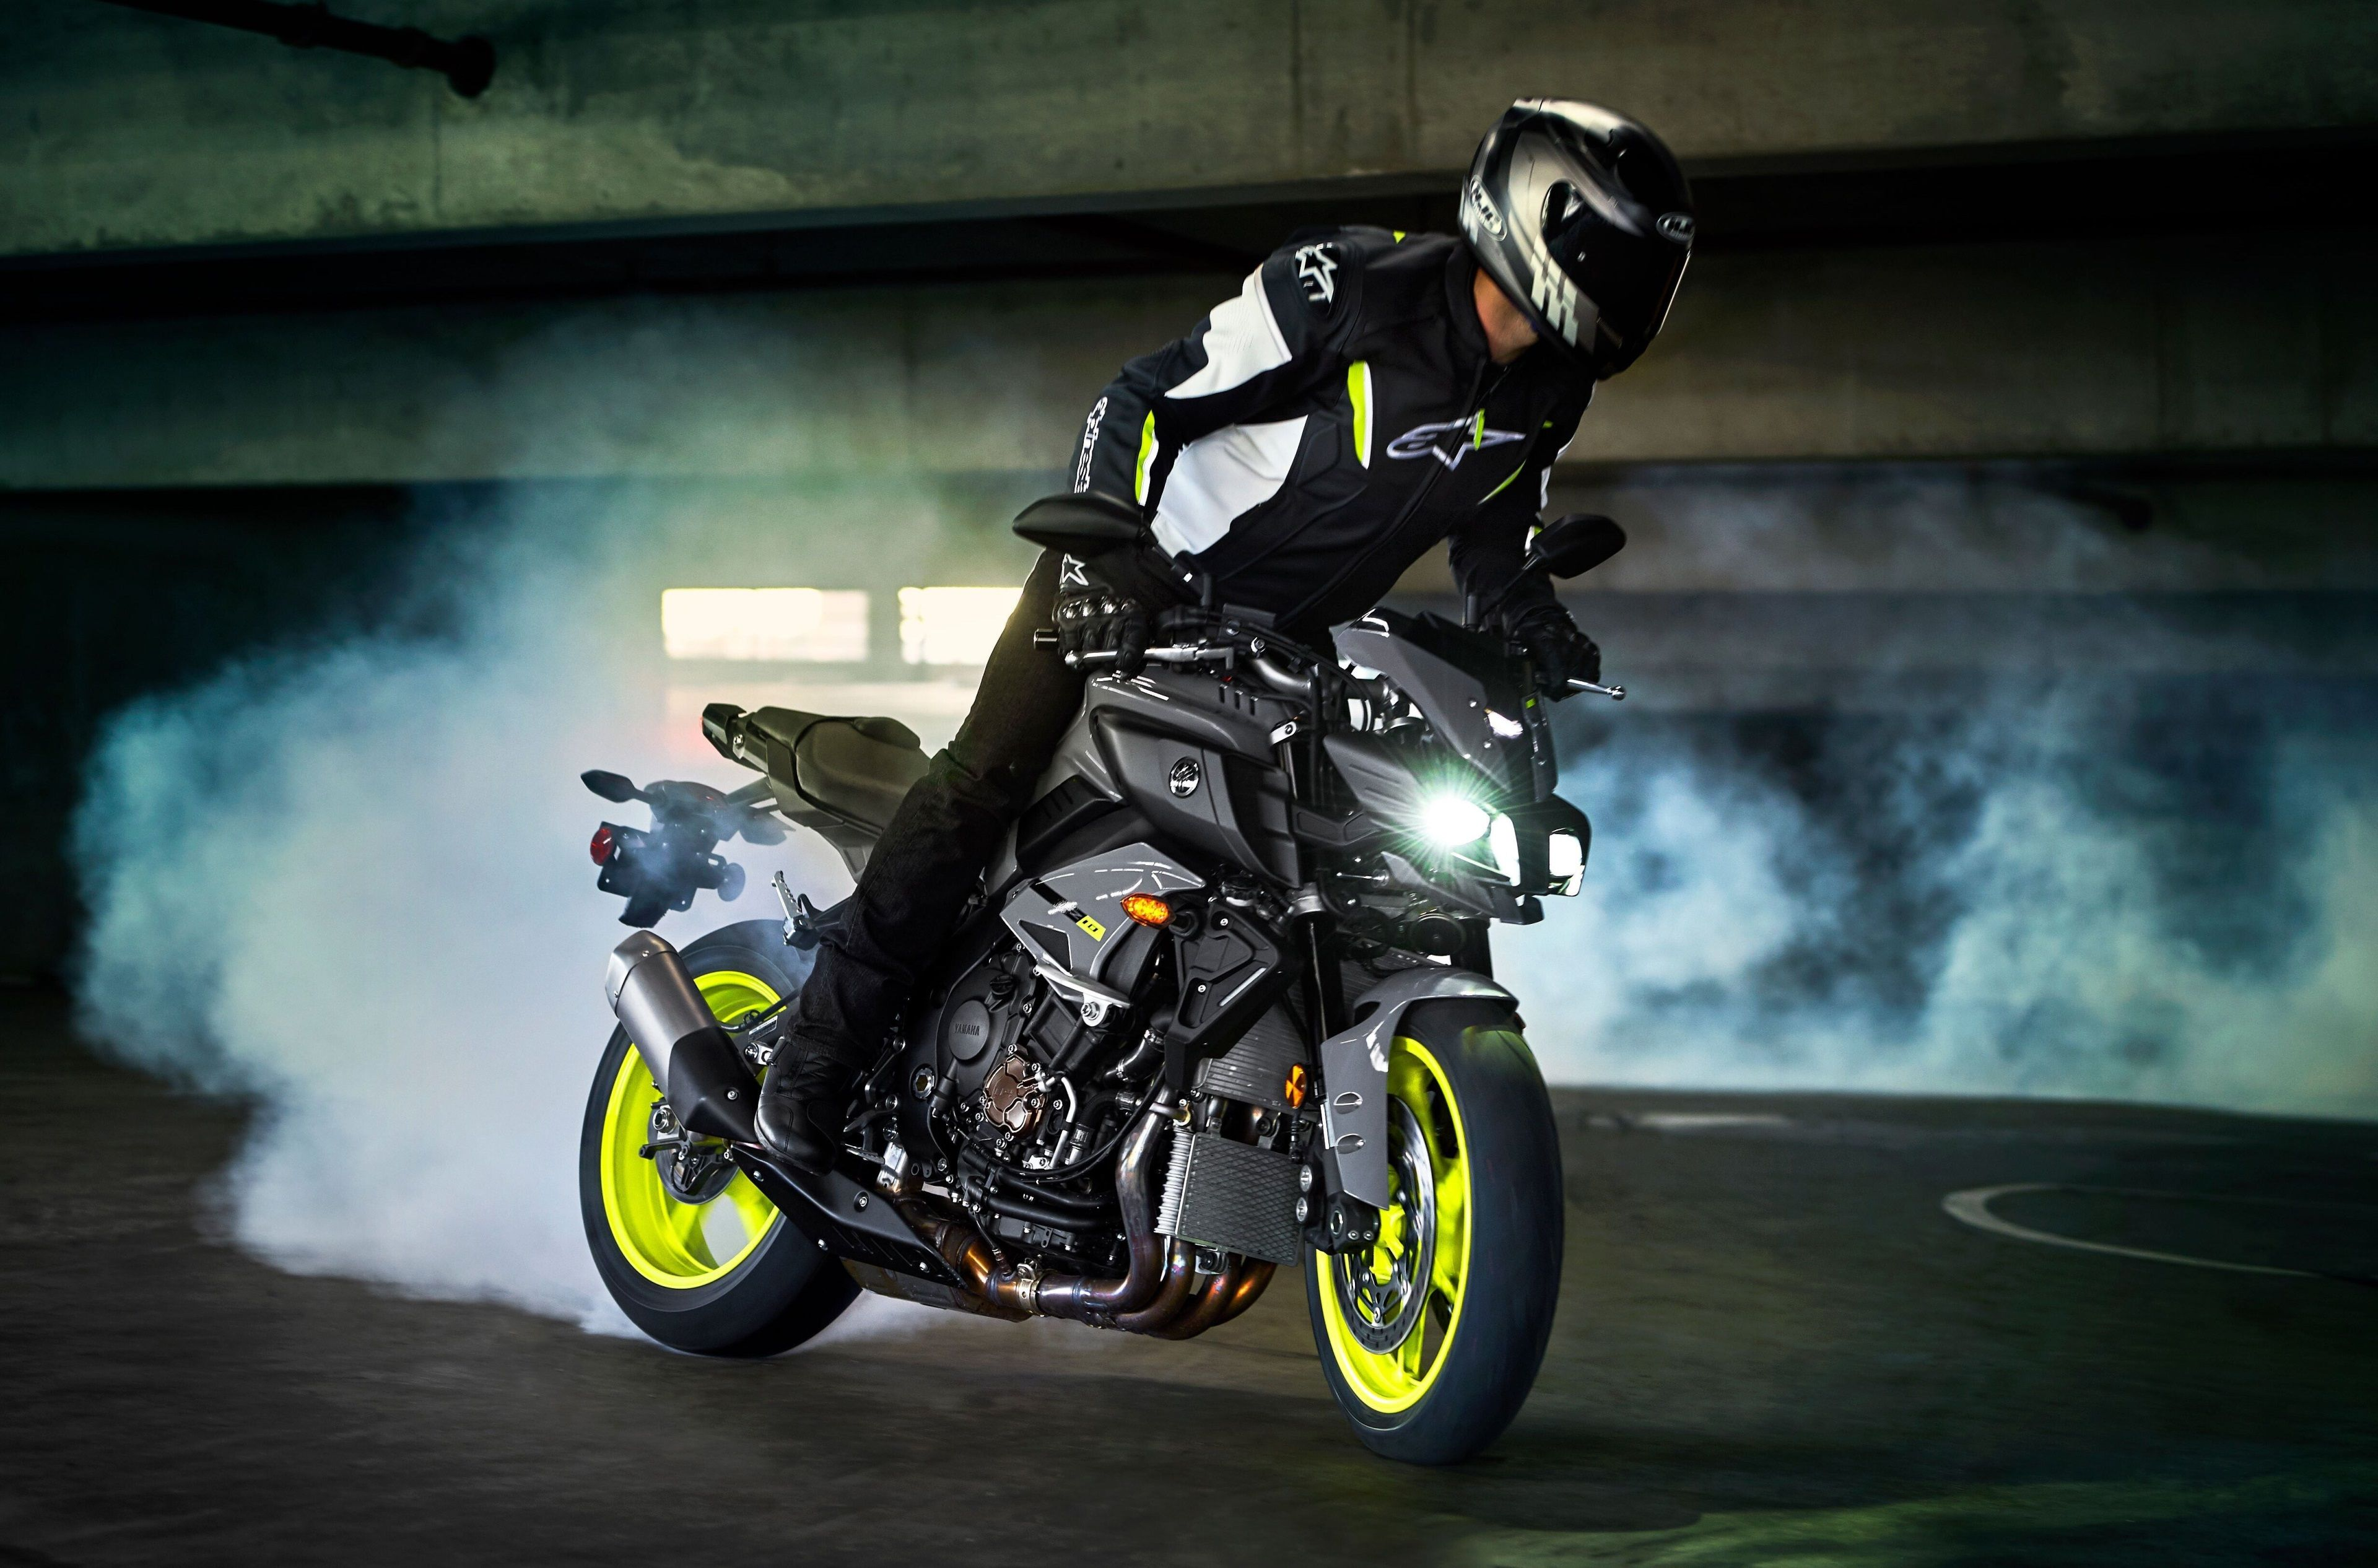 3840x2532 Yamaha Fz 10 4k Best Wallpaper Image Motorcycle